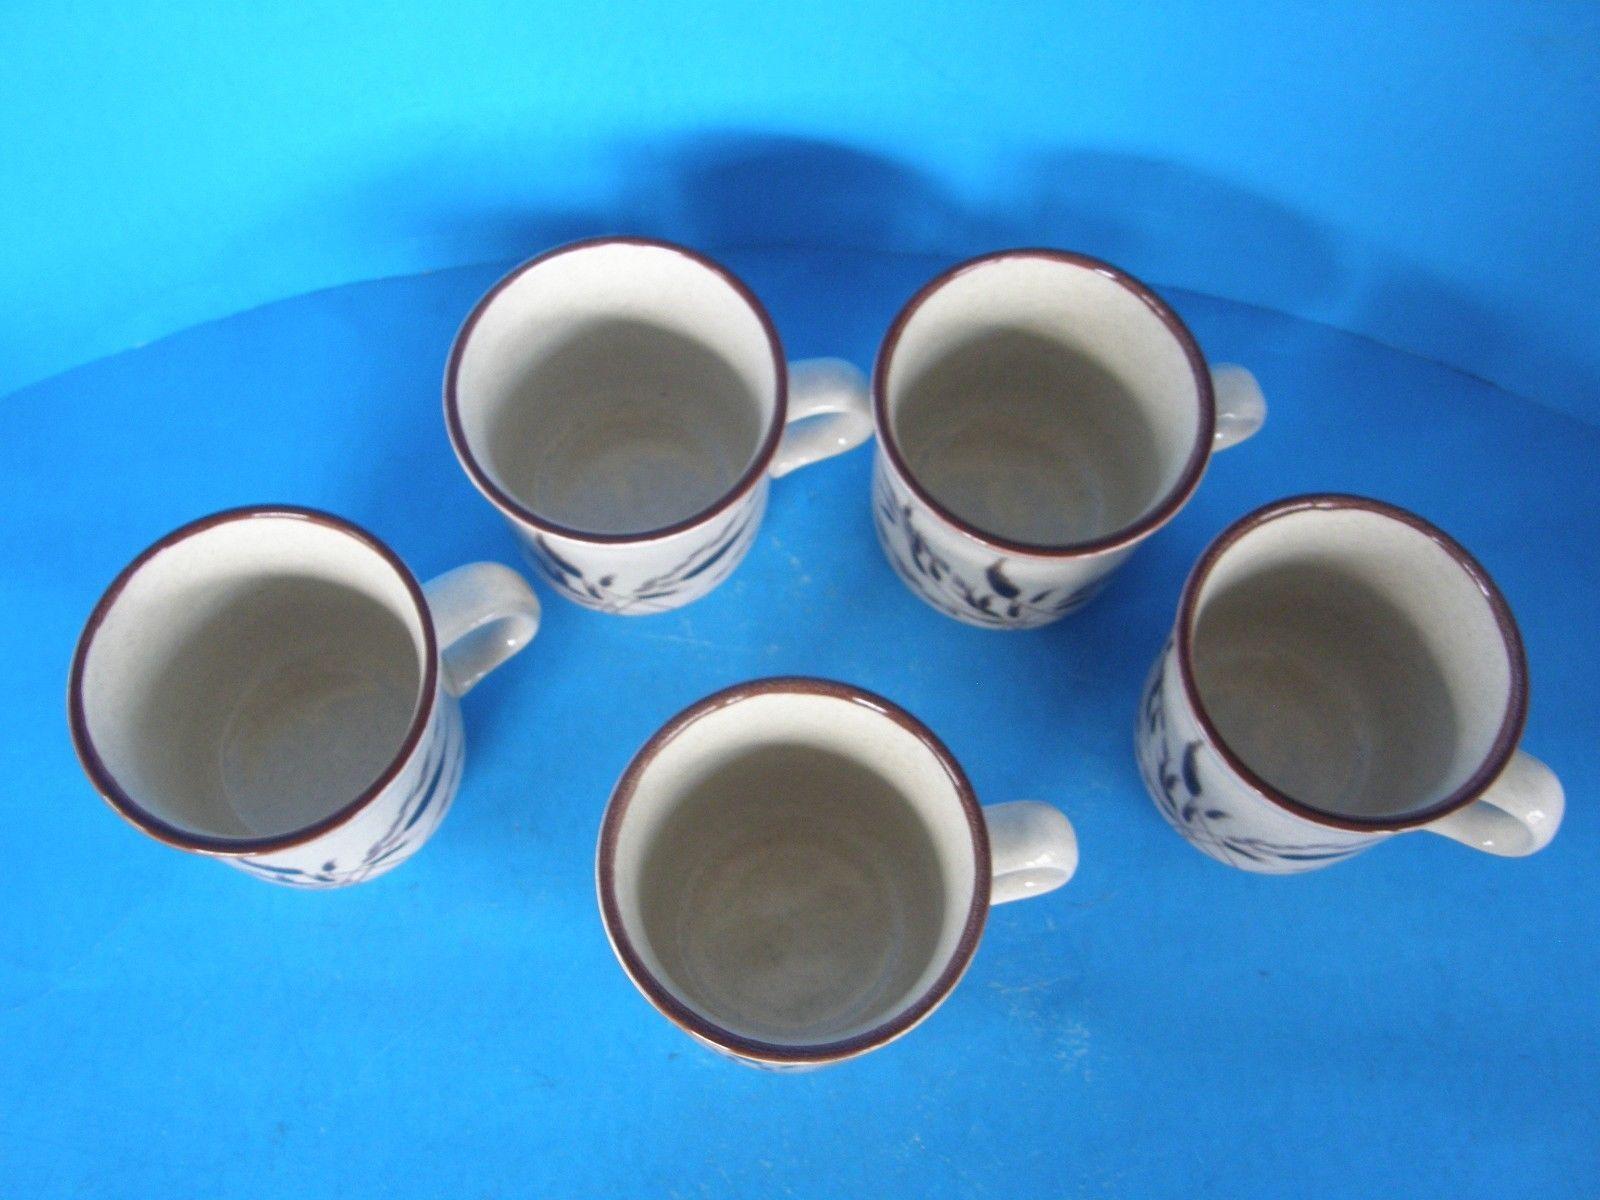 LOT OF 5 NIKKO FREEZER TO OVEN MICROWAVE OVEN & DISHWASHER SAFE COFFEE/TEA MUGS